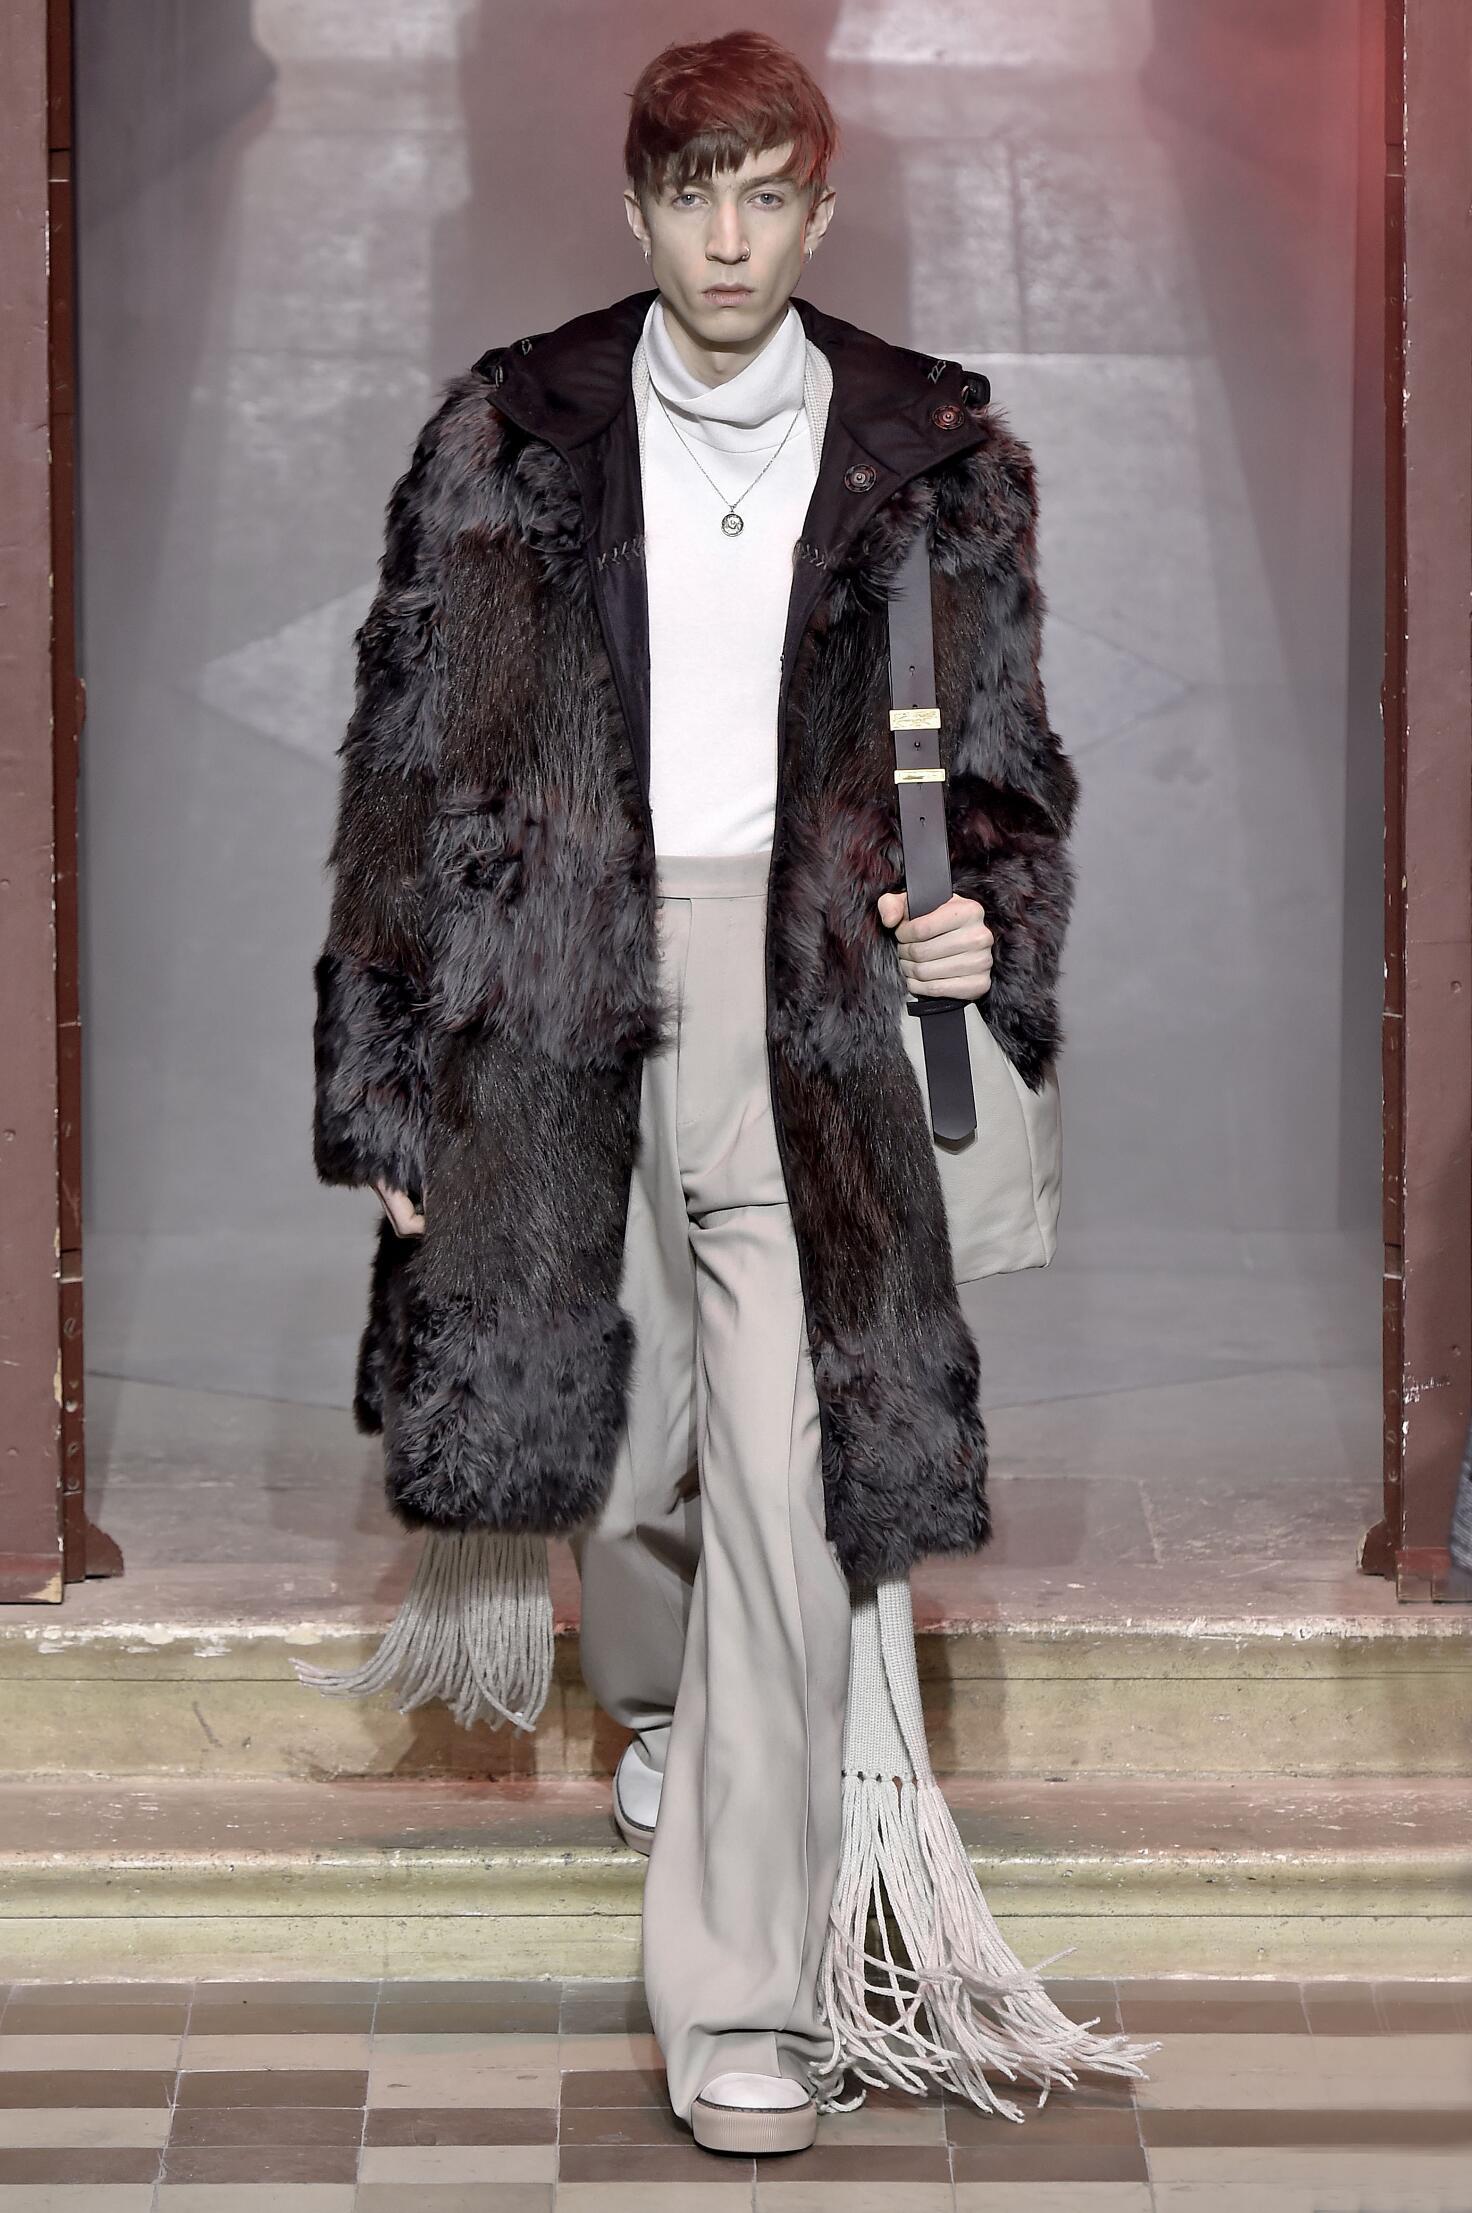 Lanvin Fall Winter 2015 16 Men's Collection Paris Fashion Week Fashion Show